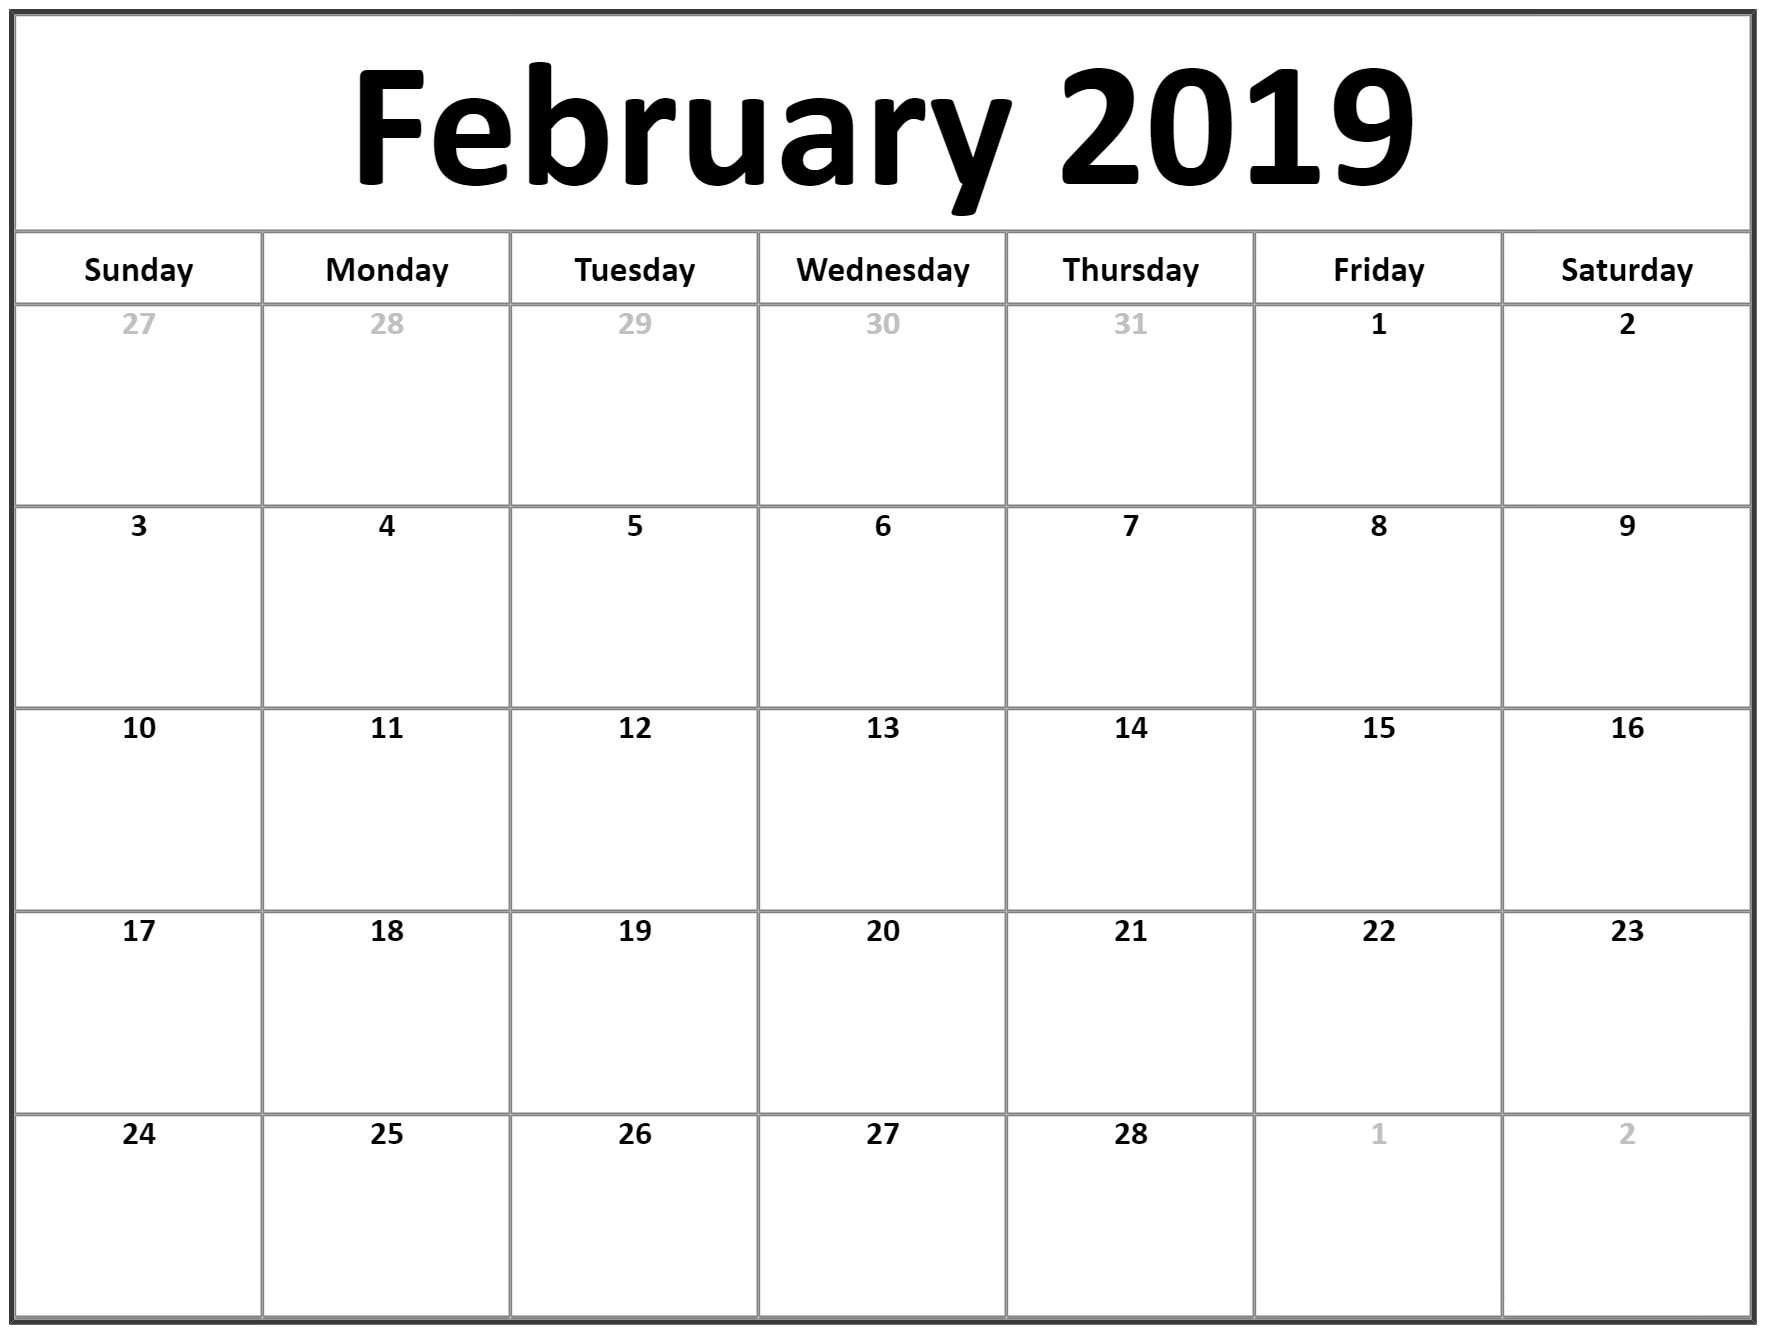 2019 Calendar Template Printable february 2019 calendar calendar template printablefebruary 2019